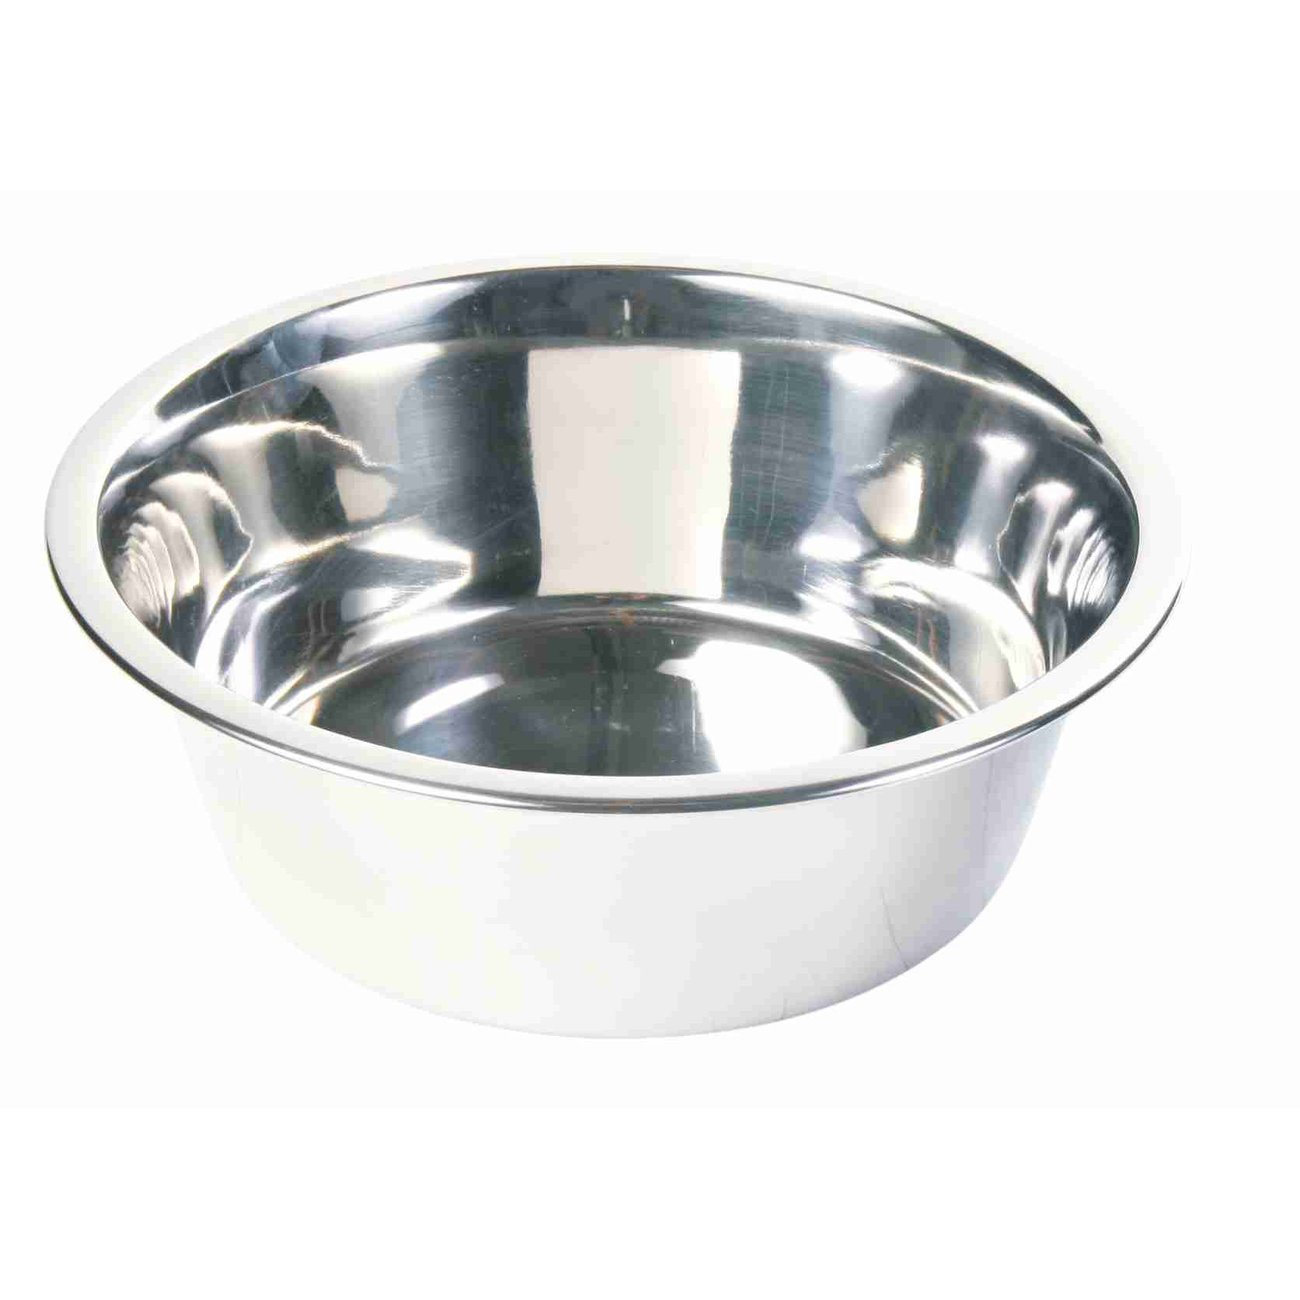 Trixie Hundenapf Edelstahl 24840, Bild 4